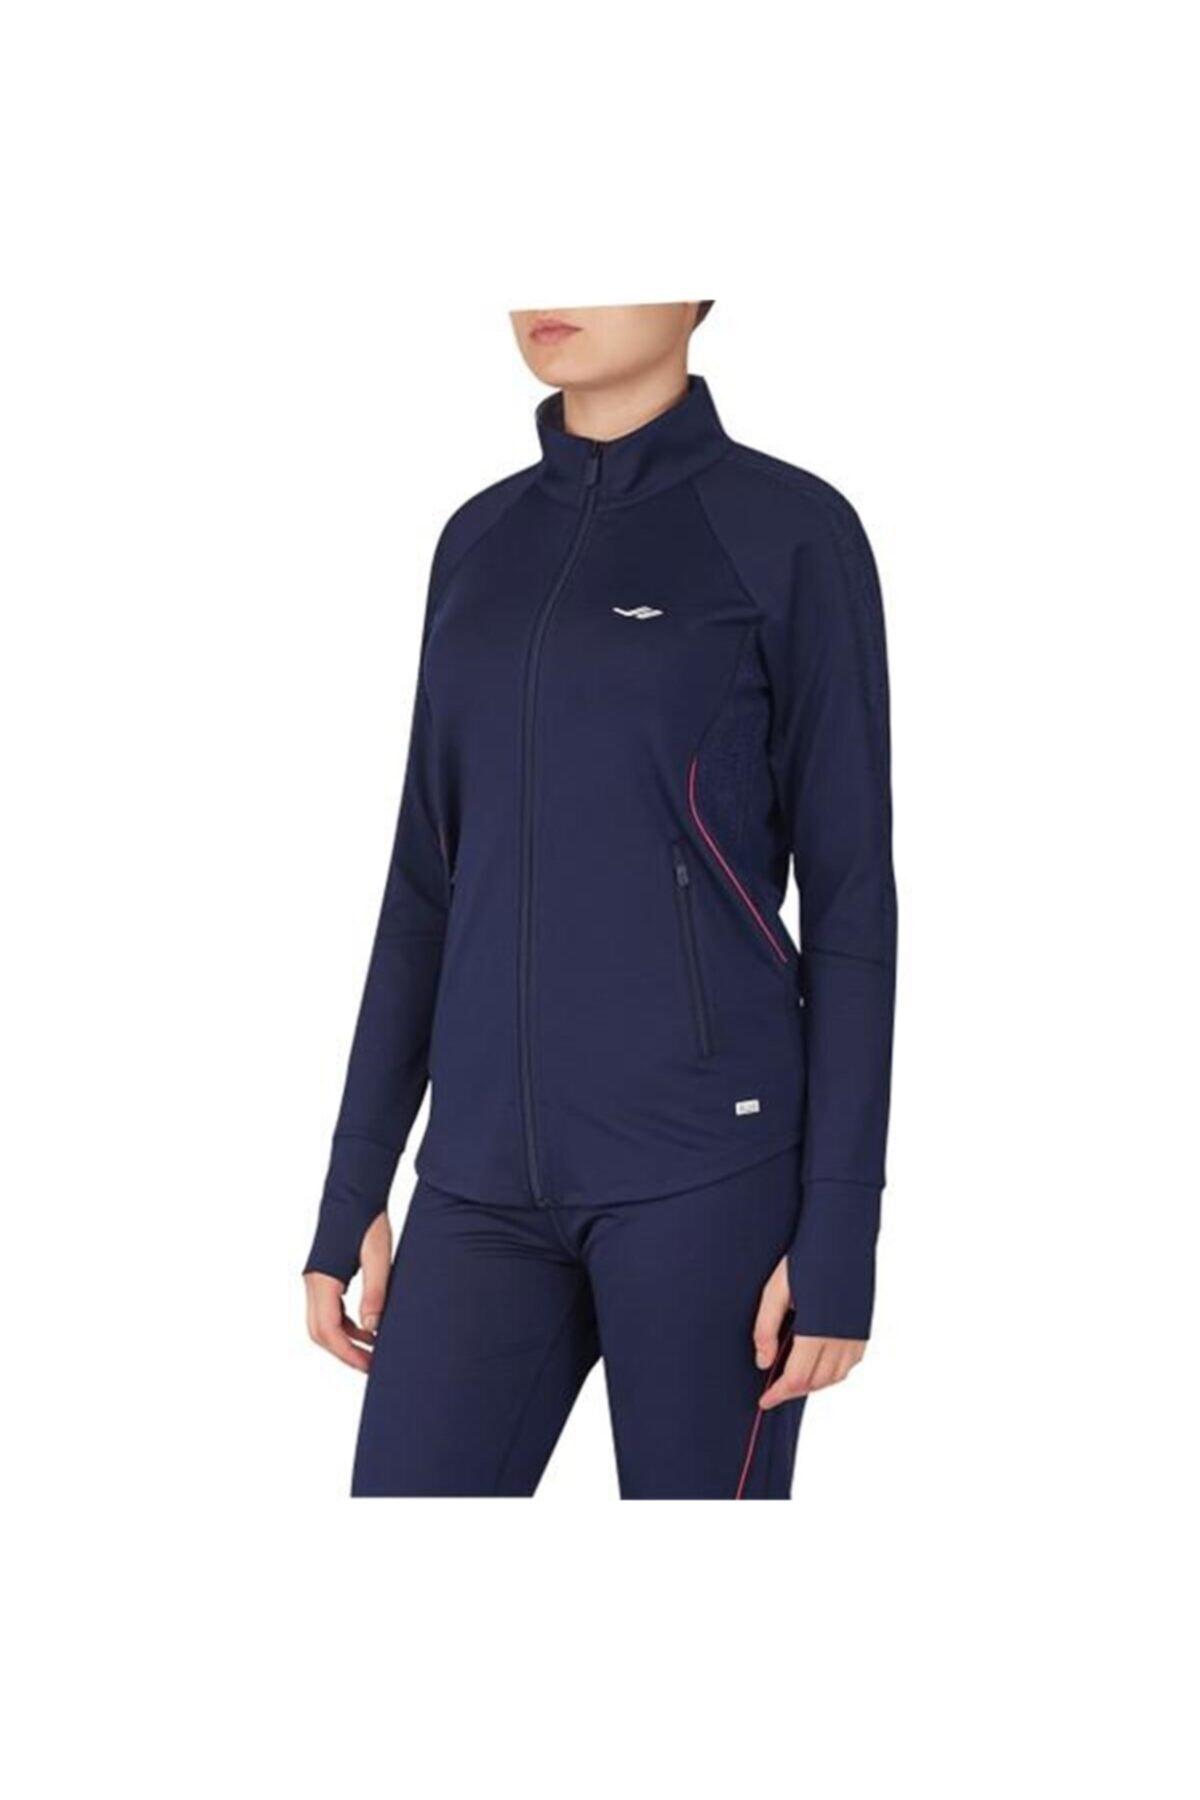 Lescon Kadın Lacivert Sweatshirt 17b-2027 1